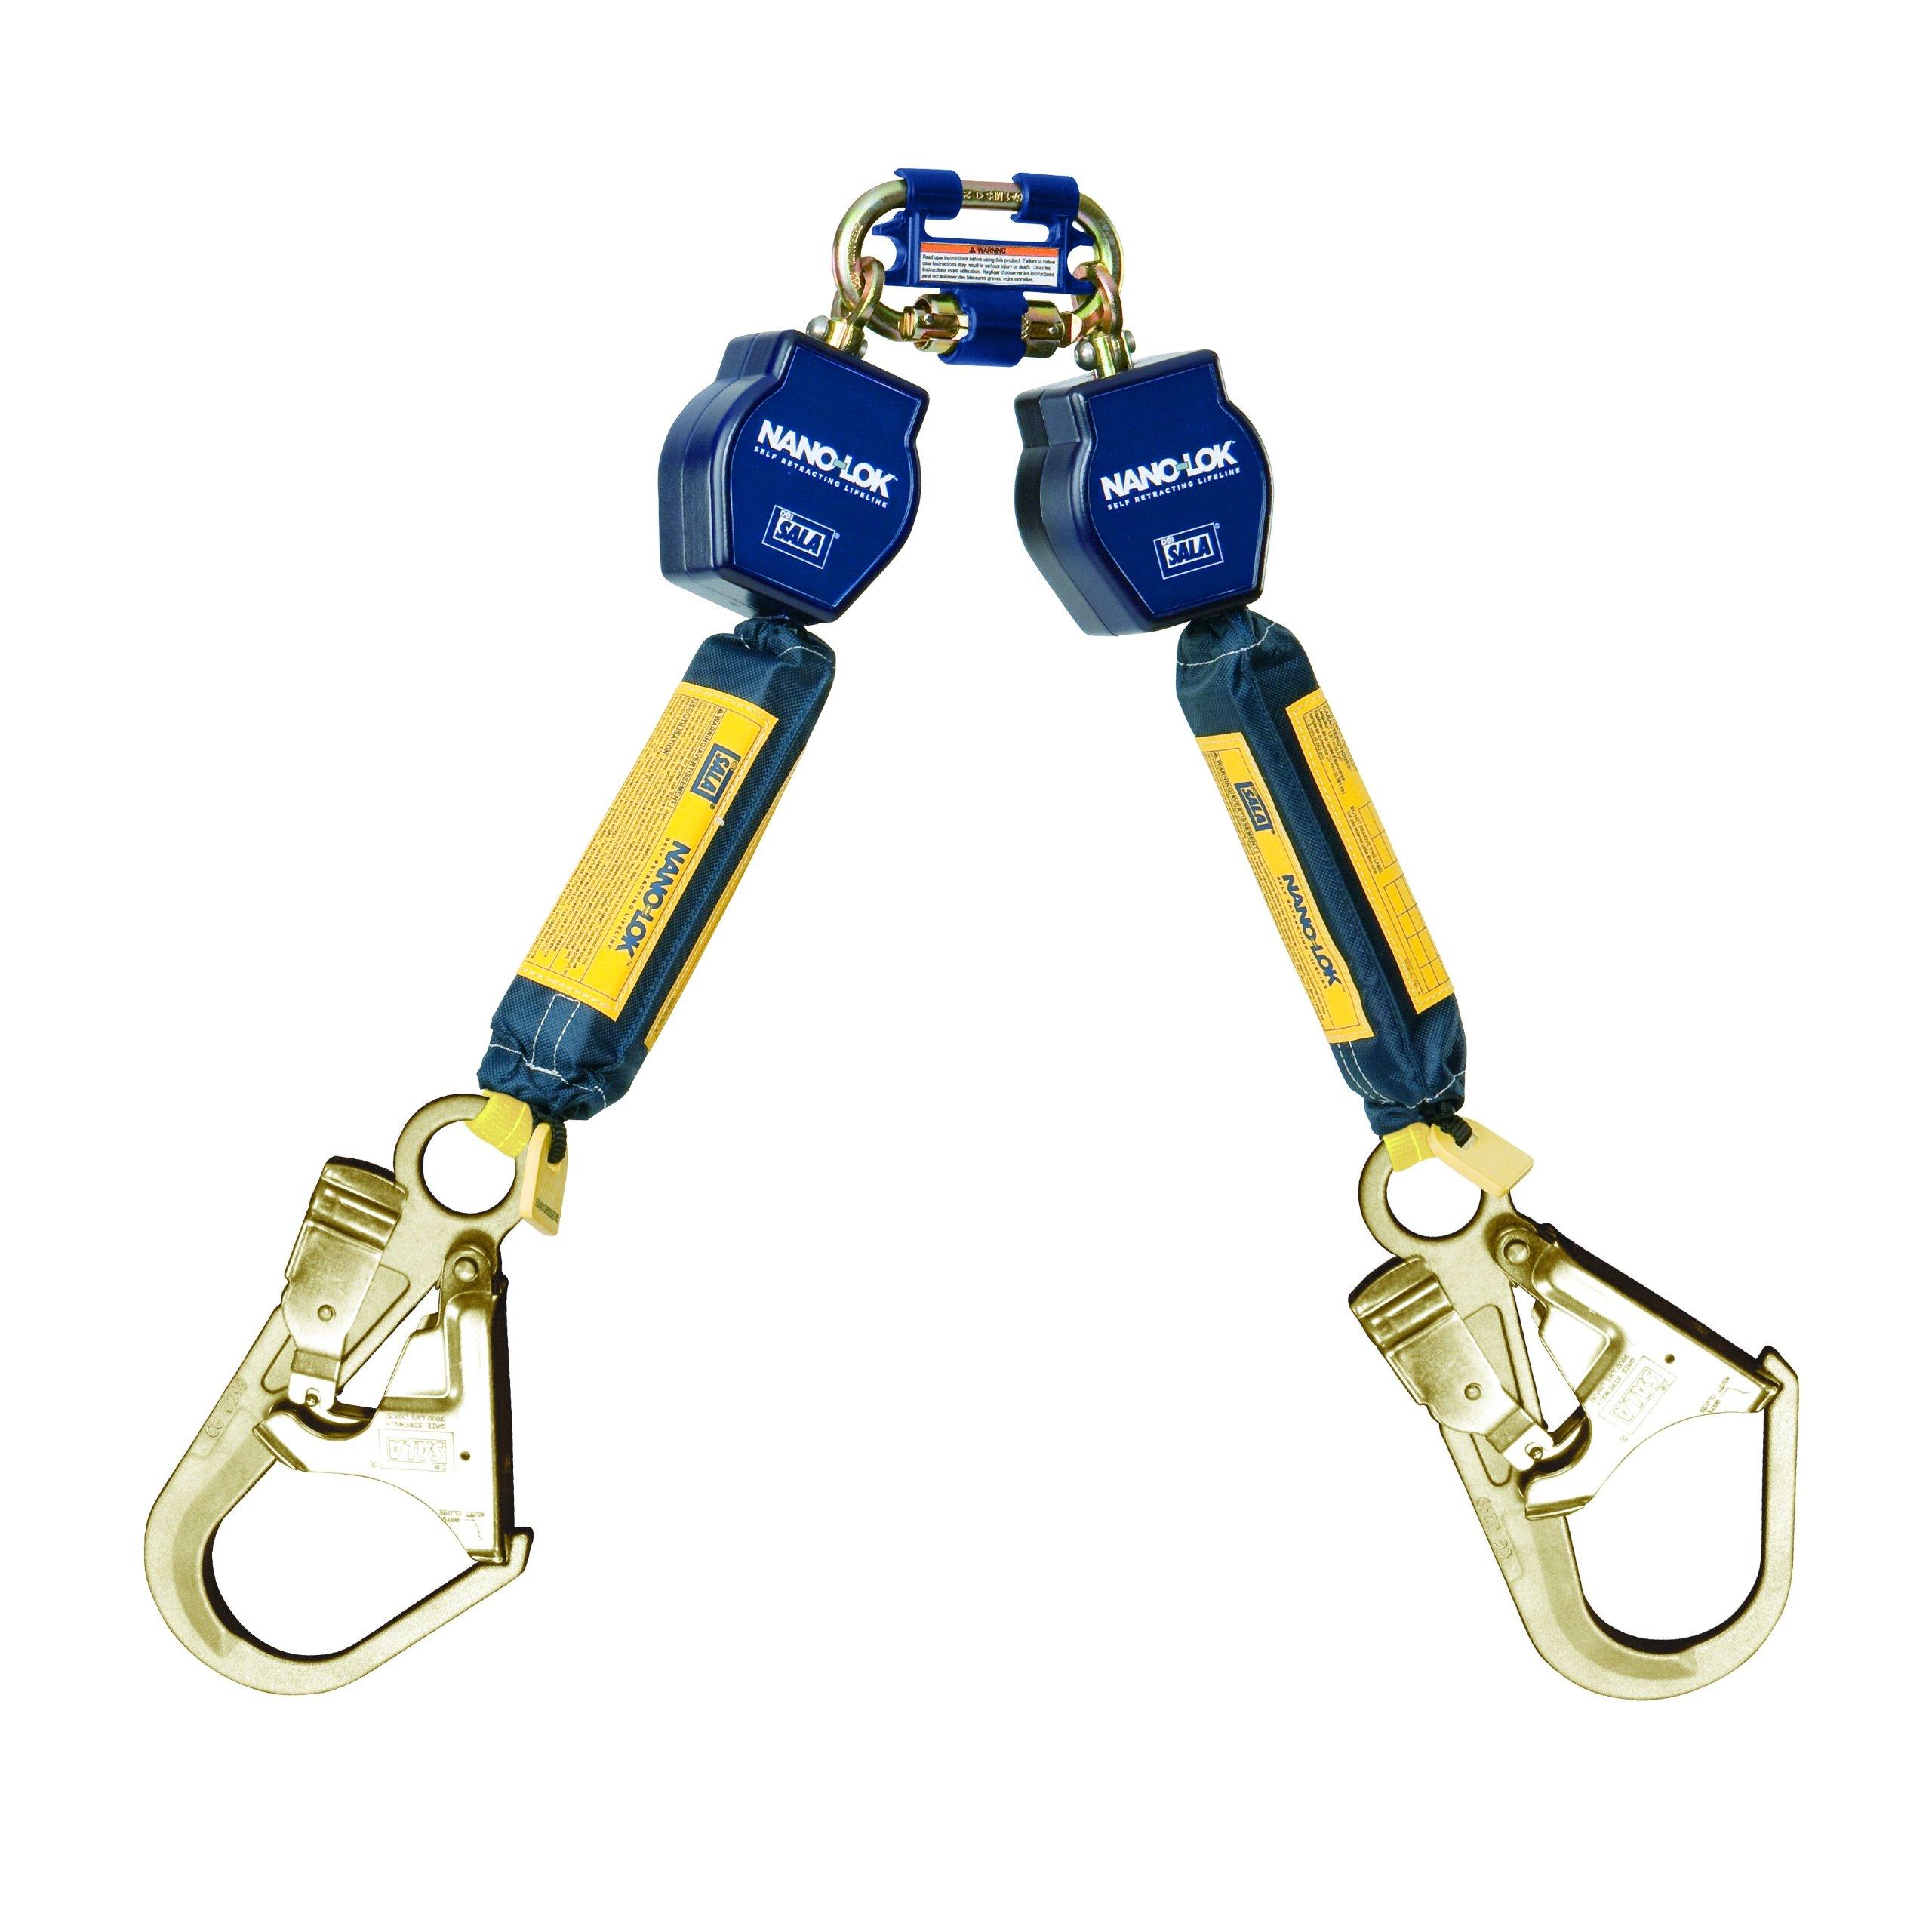 3M DBI-SALA Nano-Lok 3101280 Twin Leg Self Retracting Lifeline, 6', 3/4'' Dyneema Poly Web, Steel Rebar Hooks, Quick Connect Harness Mount,Navy/Yellow